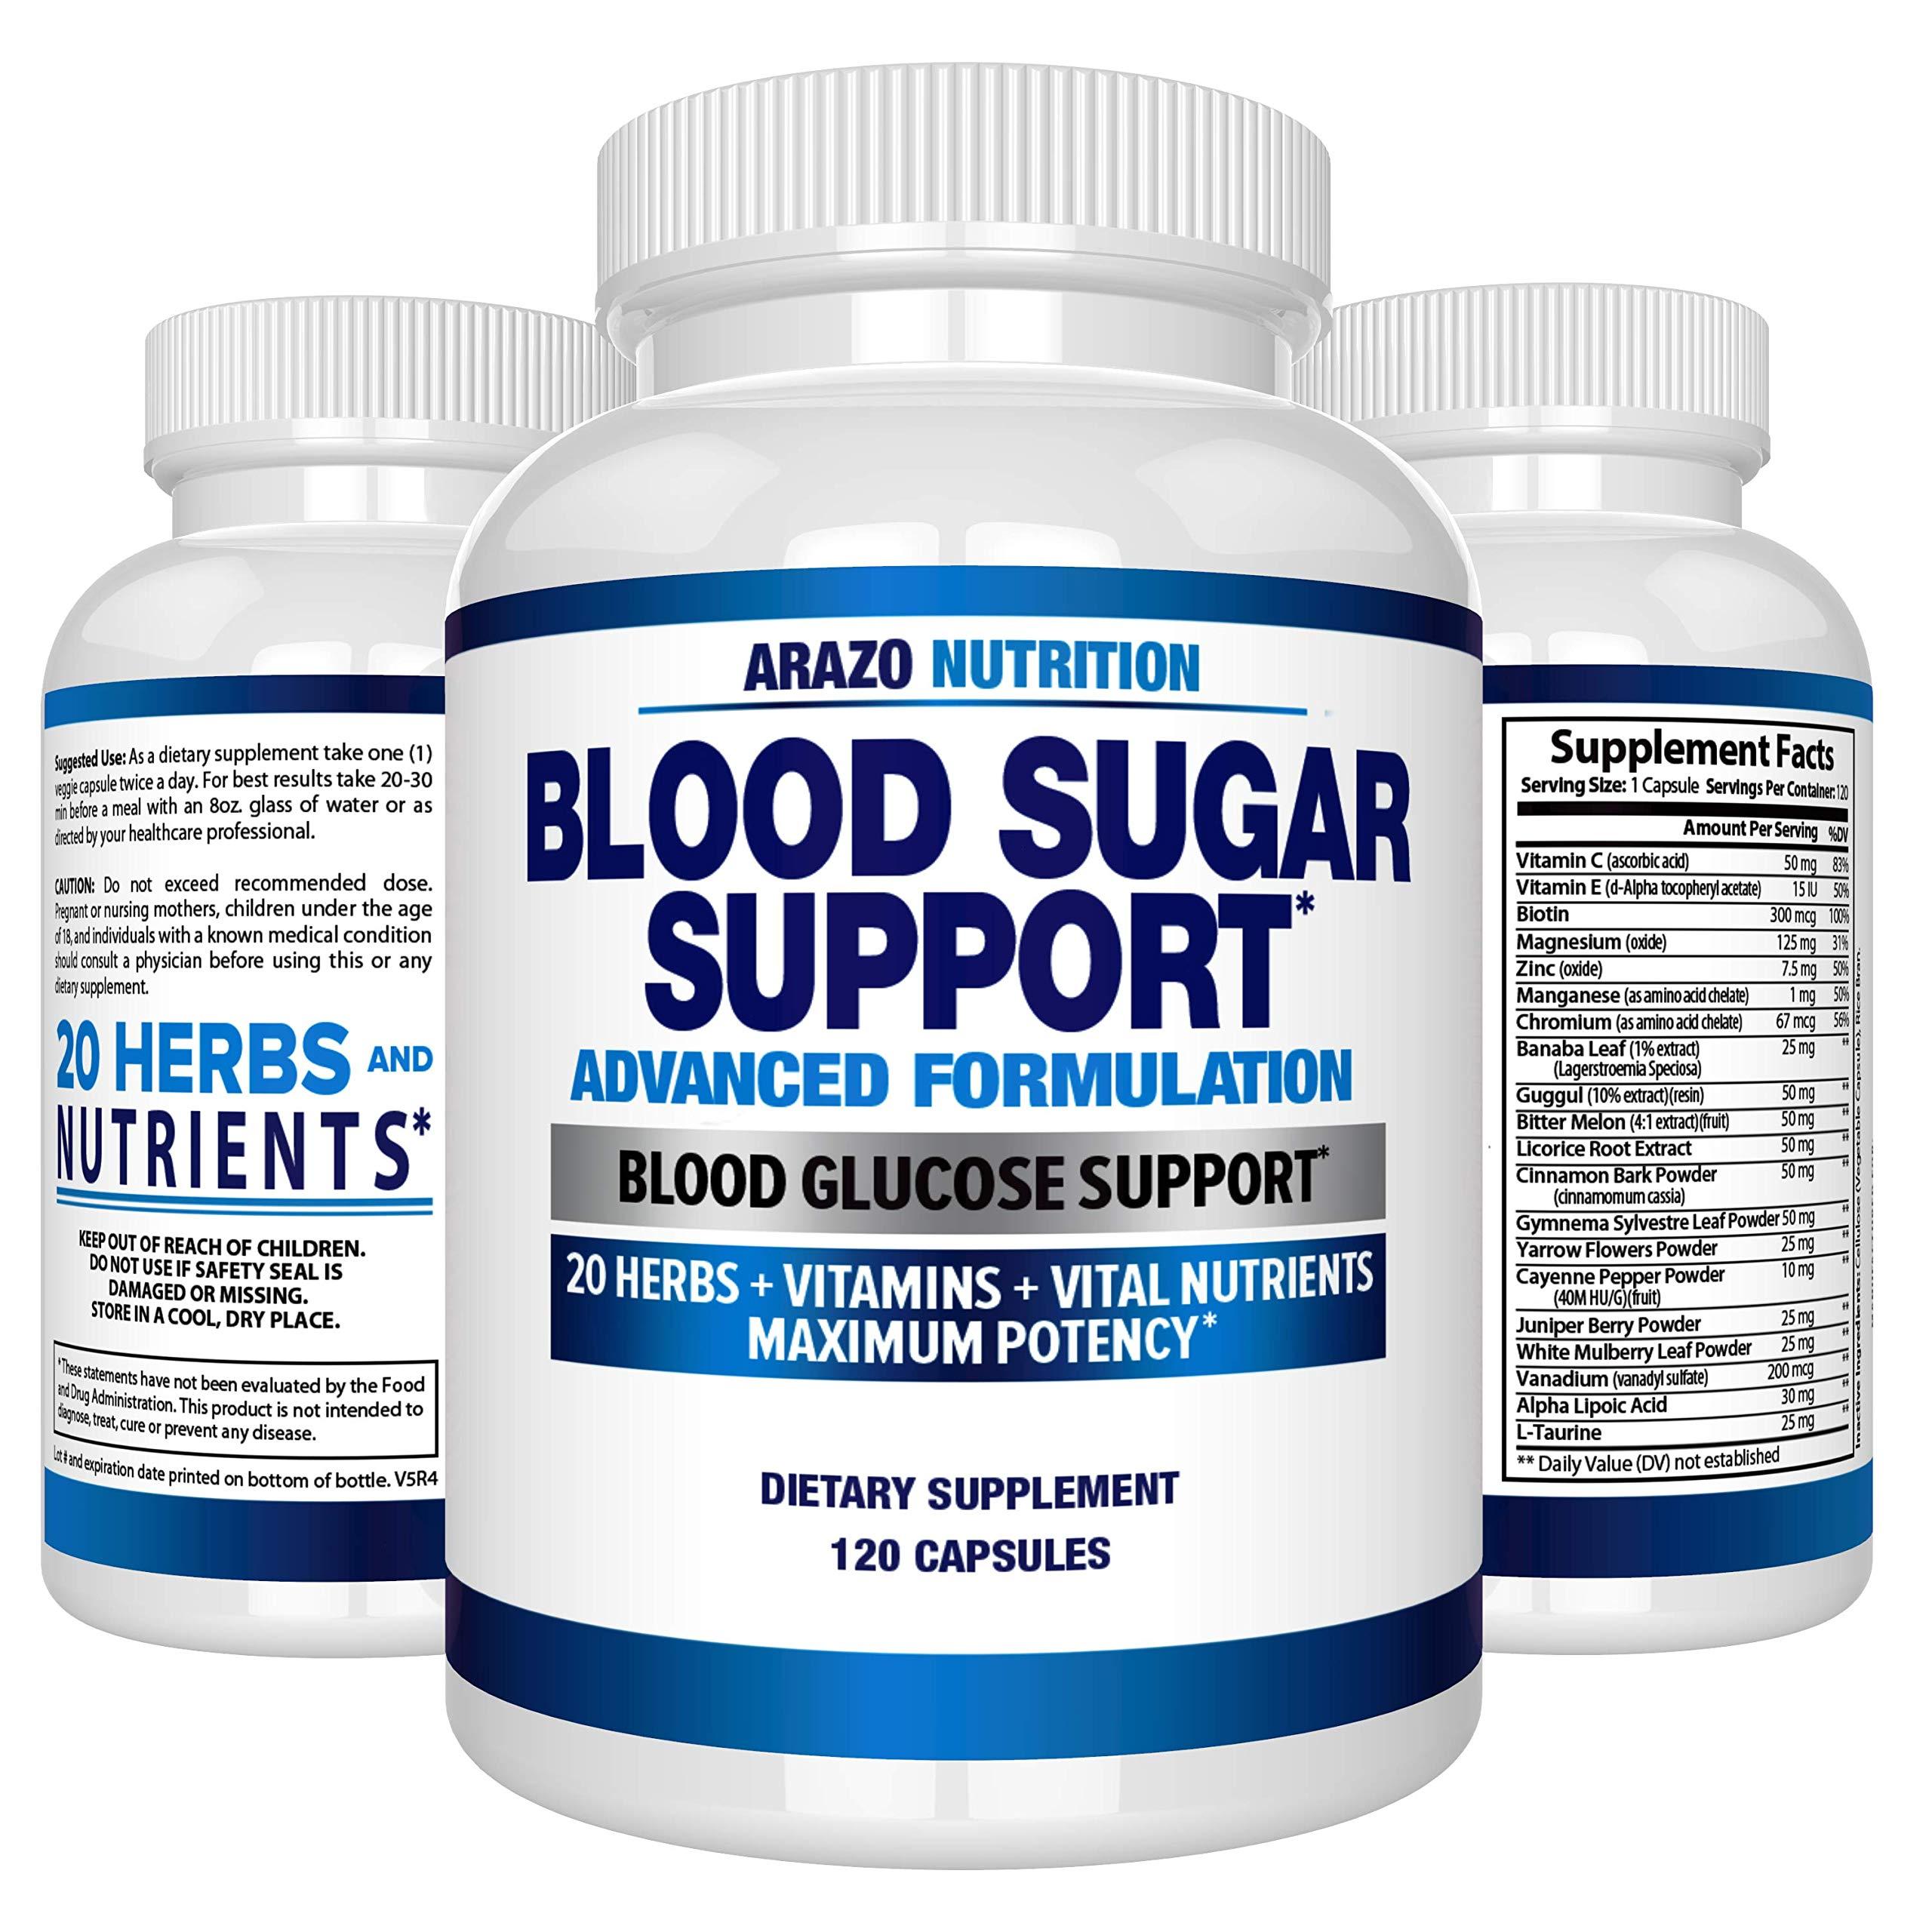 Blood Sugar Support Supplement - 20 Herbs & Multivitamin for Blood Sugar Control with Alpha Lipoic Acid & Cinnamon - 120 Pills - Arazo Nutrition by Arazo Nutrition